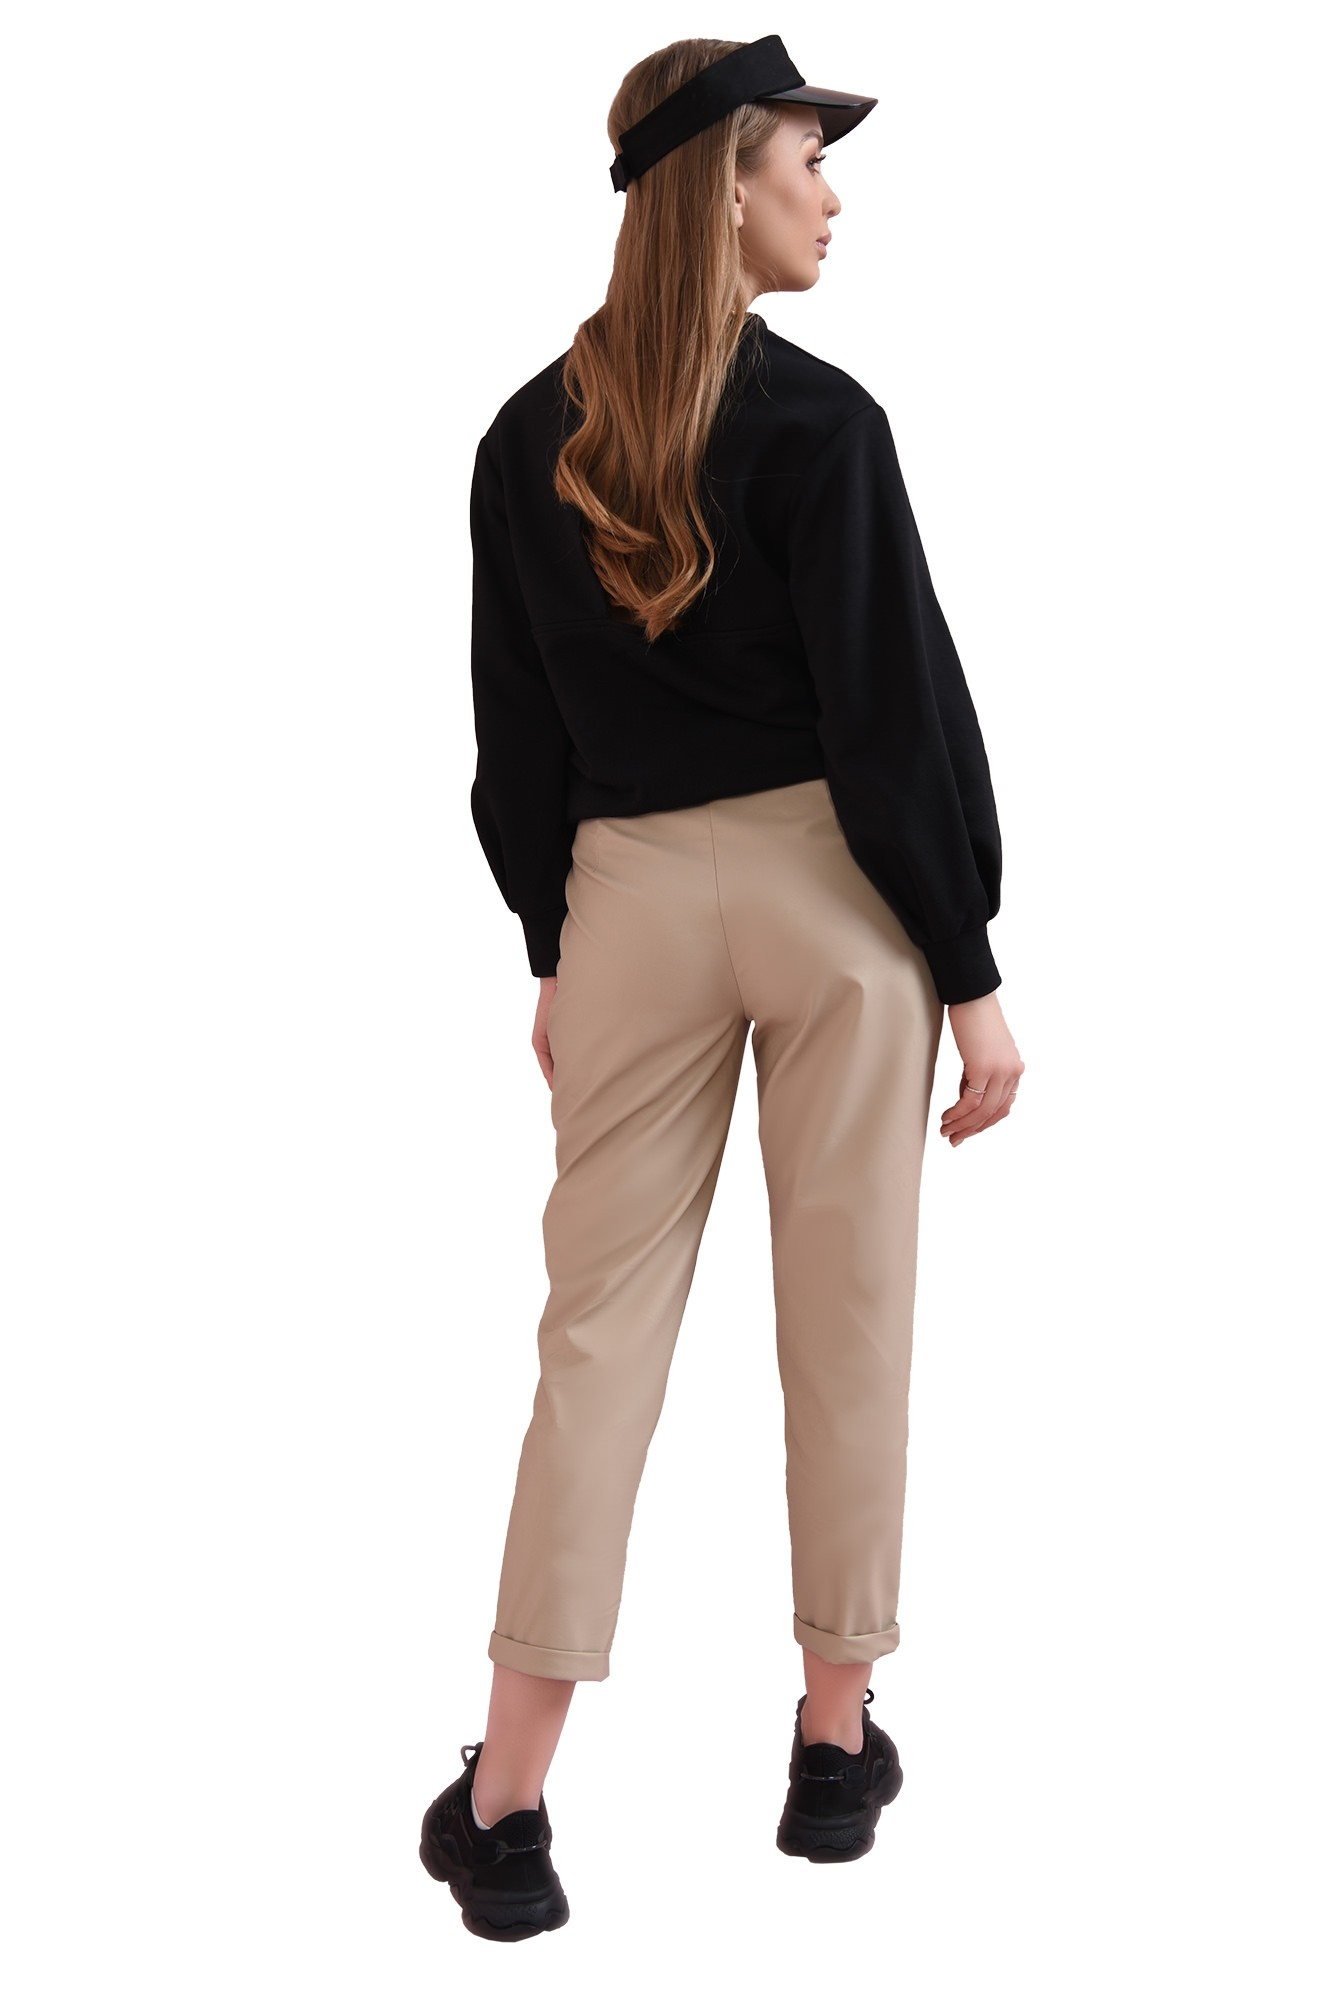 3 - pantaloni casual, cu talie medie, cu buzunare